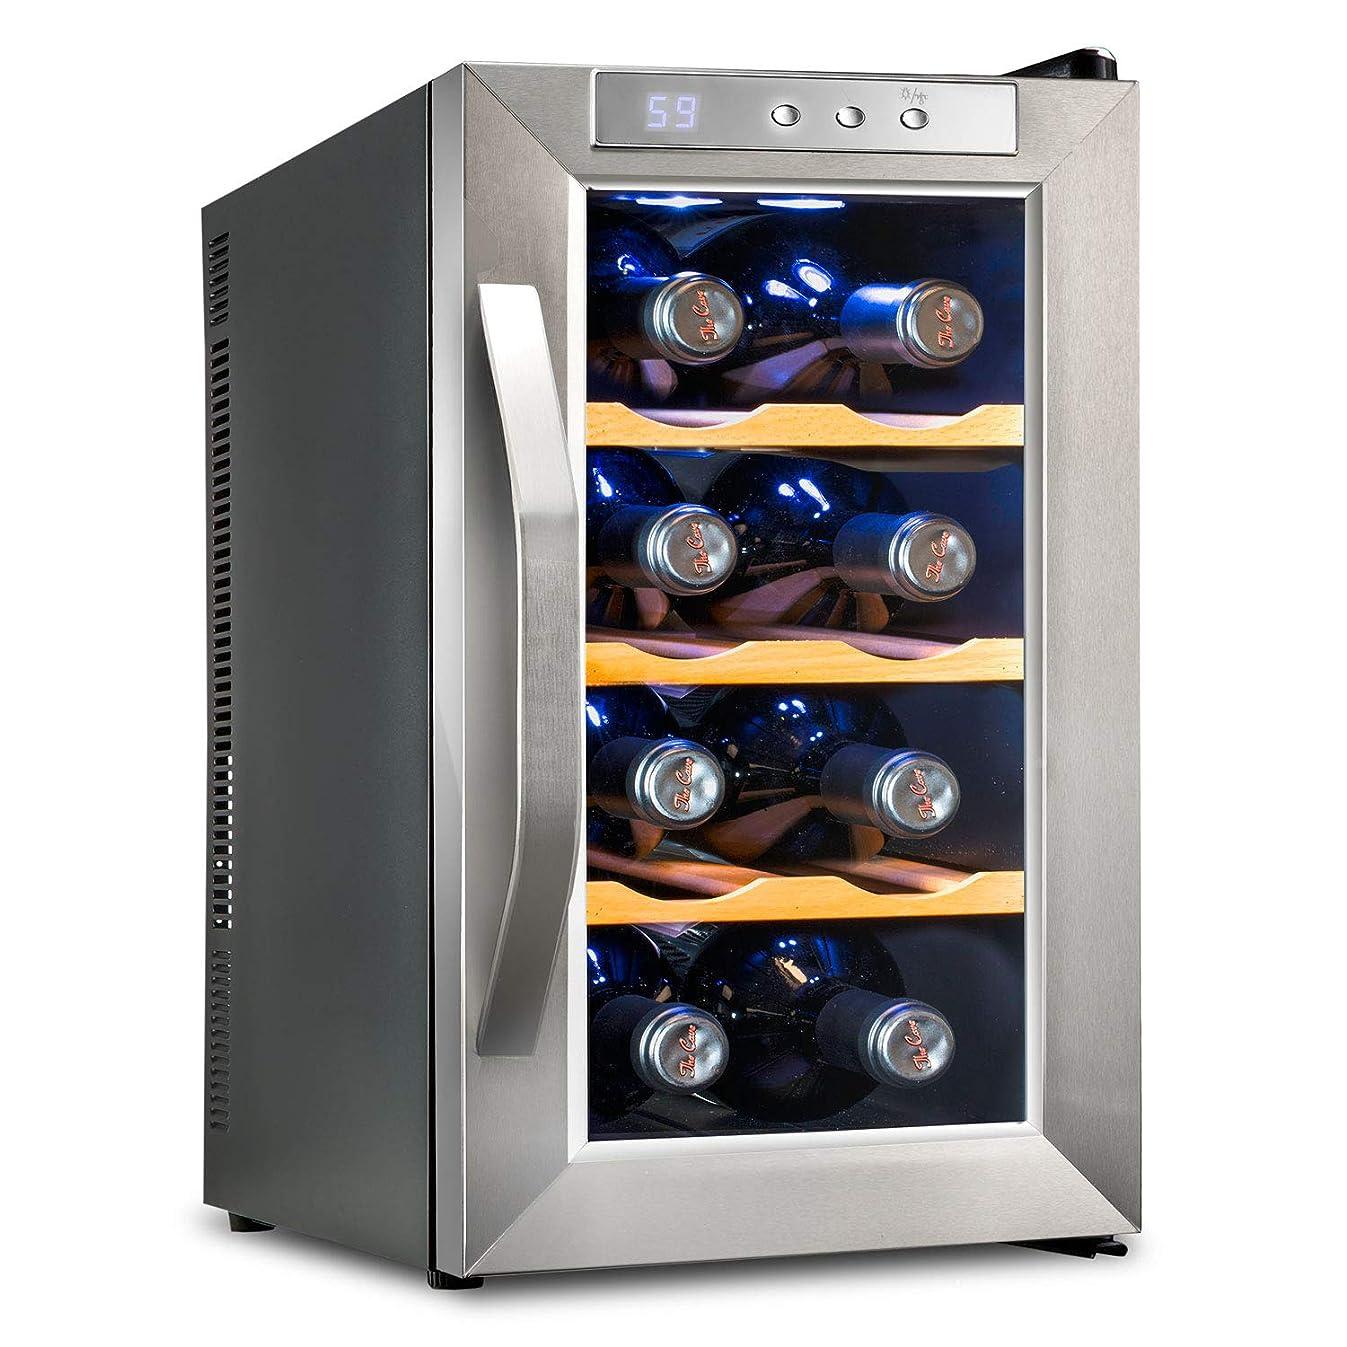 Ivation Premium Stainless Steel 8 Bottle Thermoelectric Wine Cooler/Chiller Counter Top Red & White Wine Cellar w/Digital Temperature, Freestanding Refrigerator Glass Door Quiet Operation Fridge